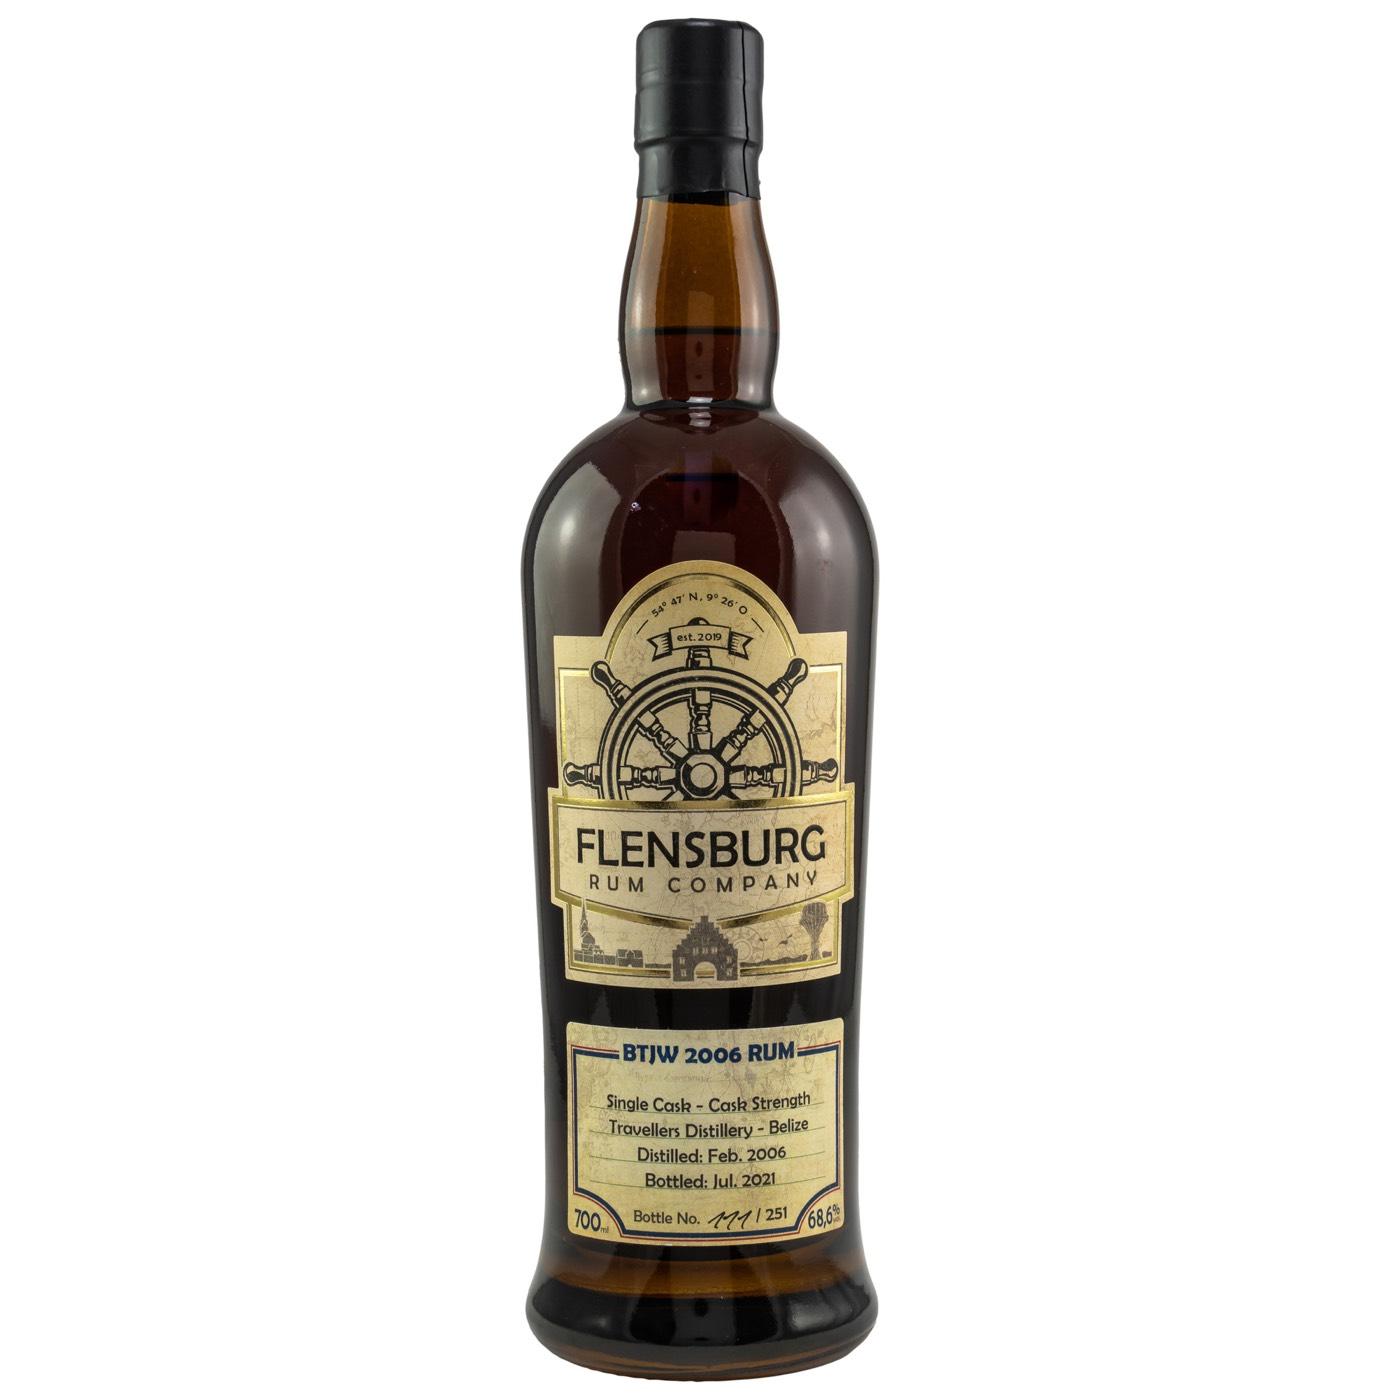 Bottle image of Flensburg Rum Company Selected by Jürgen Wiese BTJW